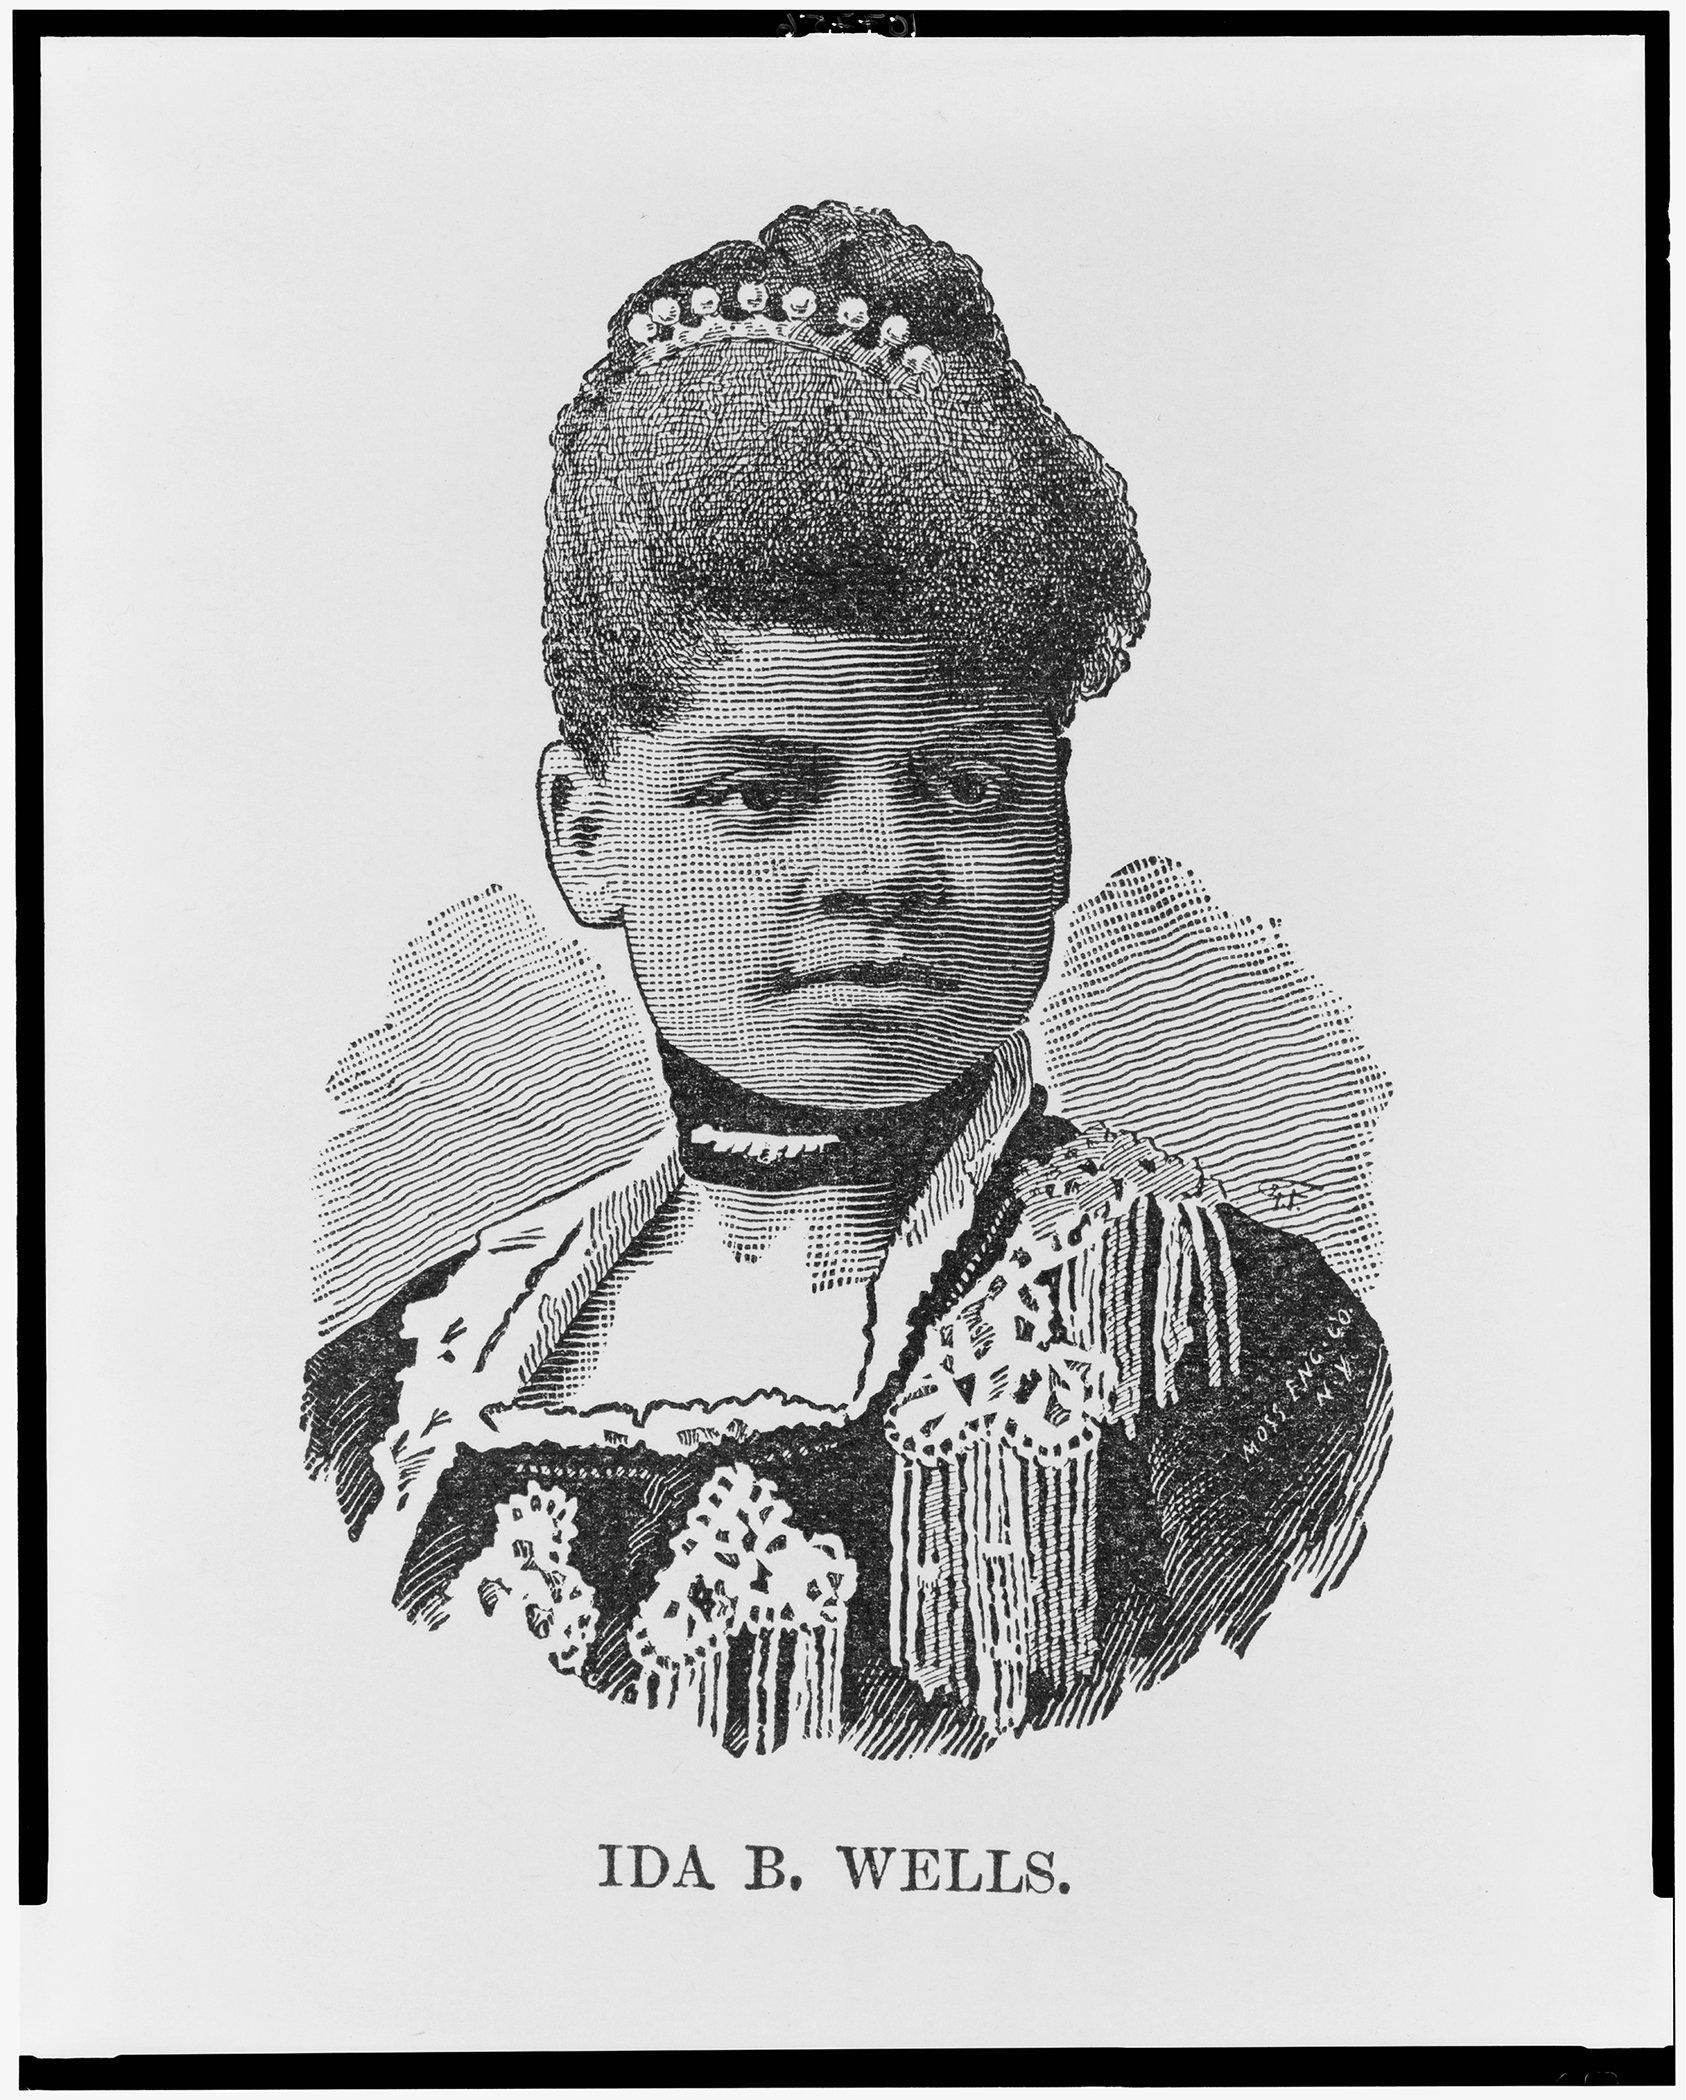 Ida-B-Wells-Black-History-Month.jpg